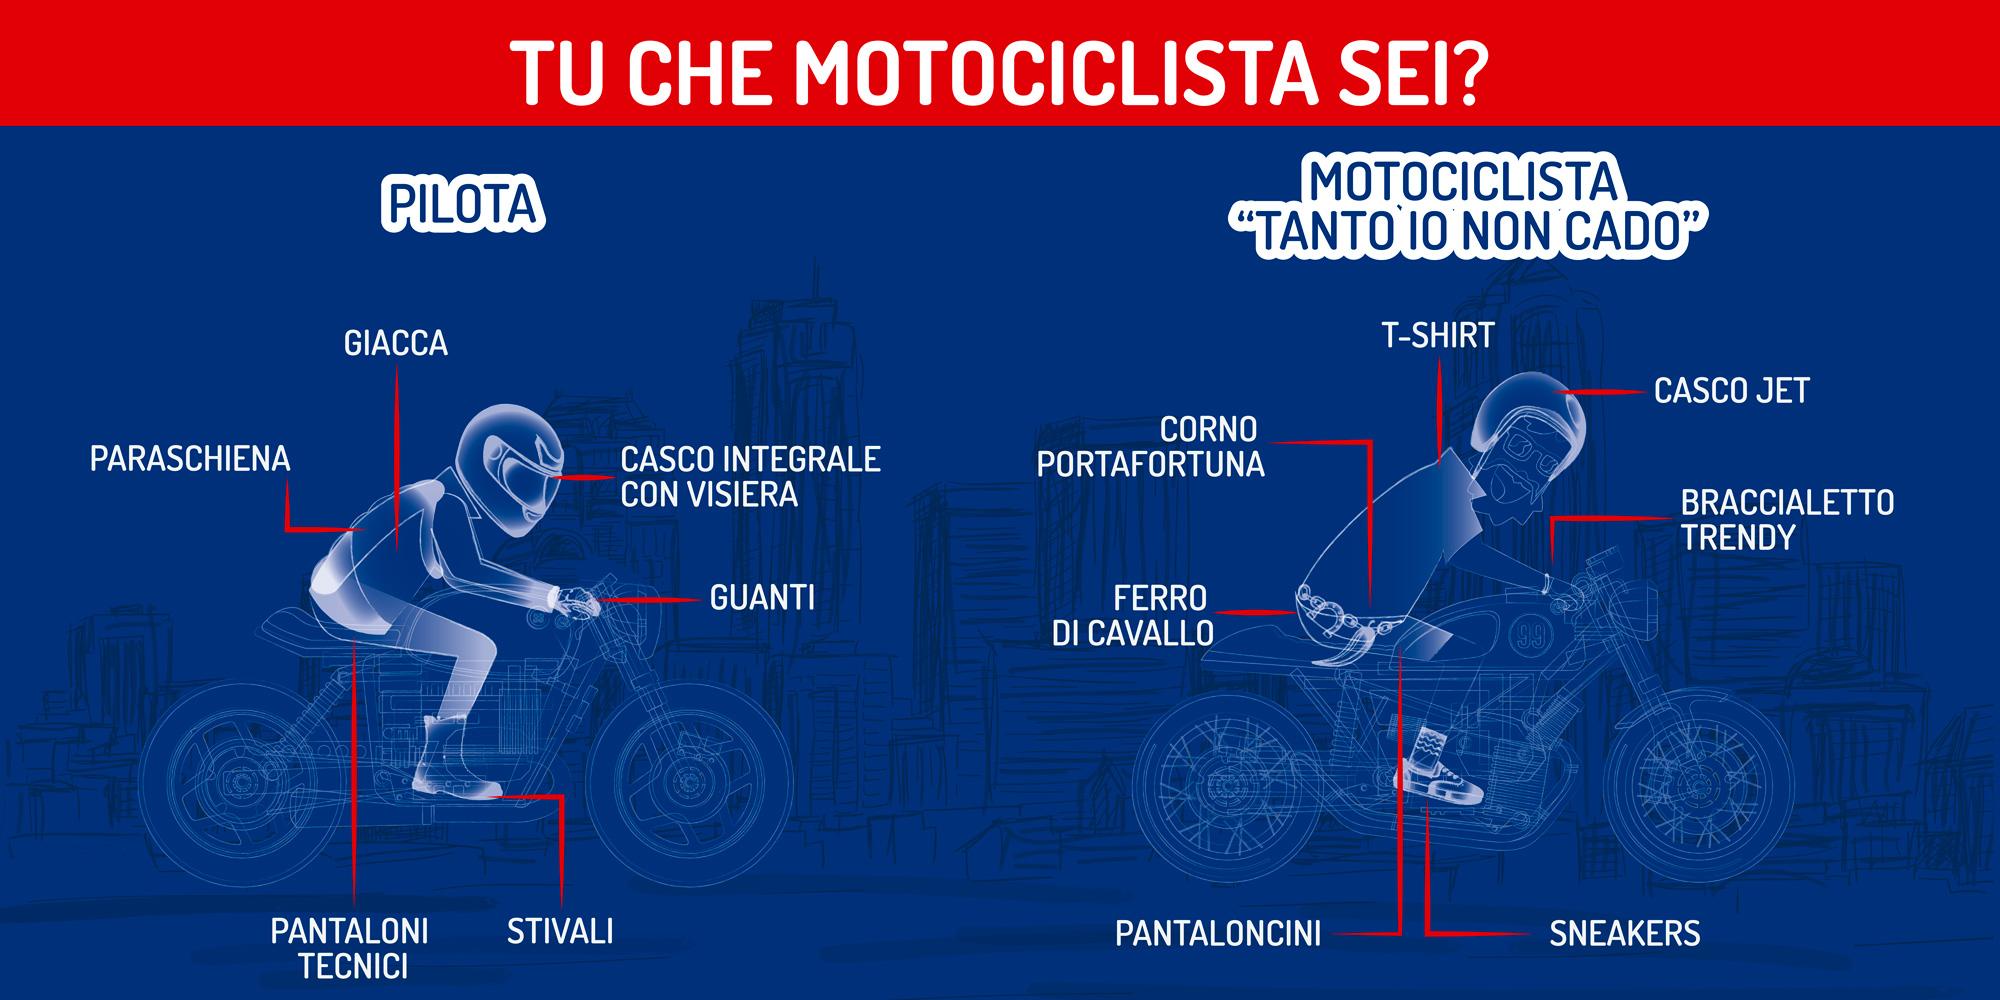 "Pilota vs Motociclista ""Tanto io non cado"" - A.M.I. onlus"